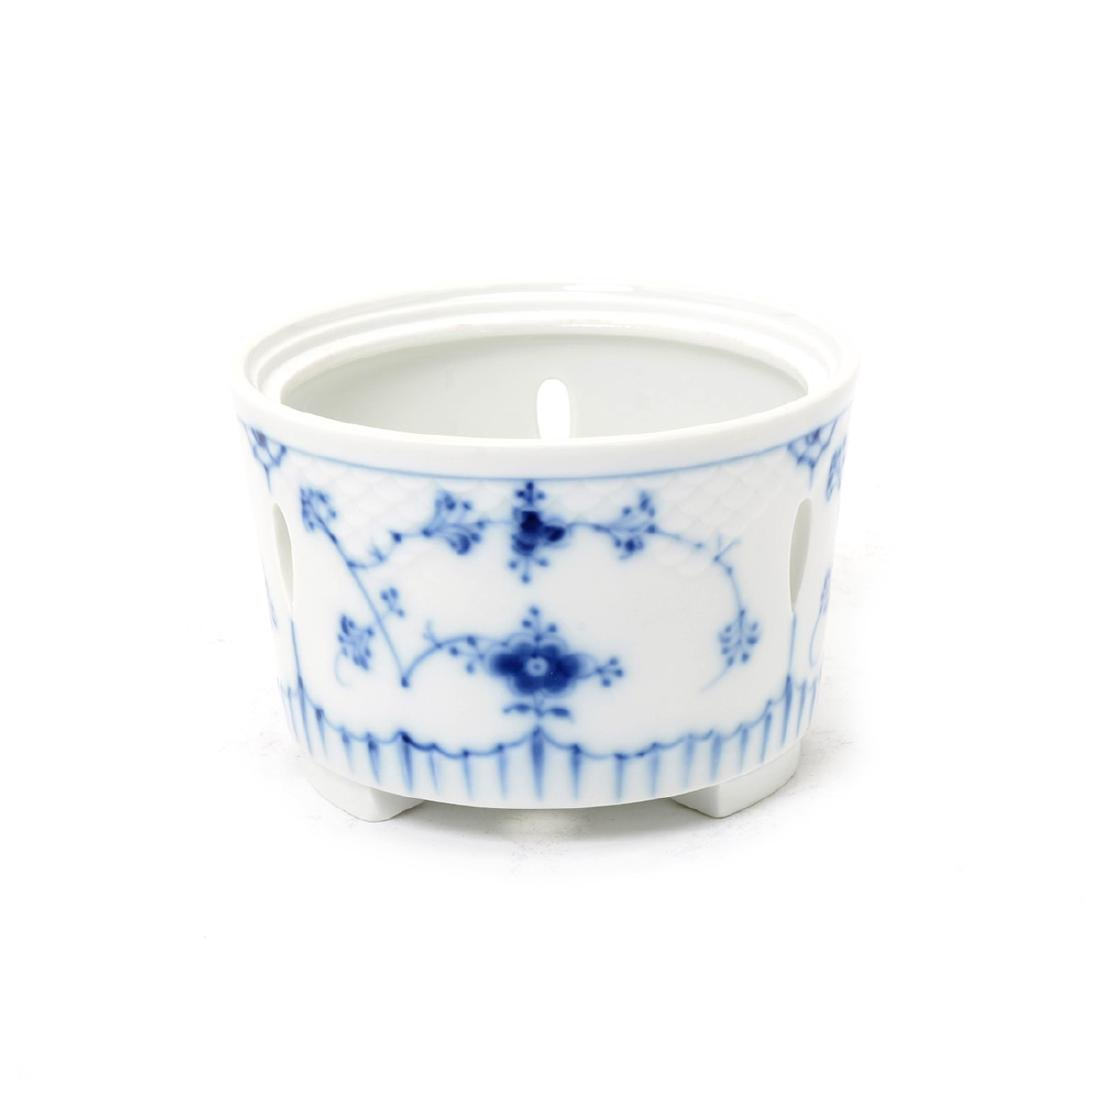 Royal Copenhagen Porcelain Serving and Table Articles - 4